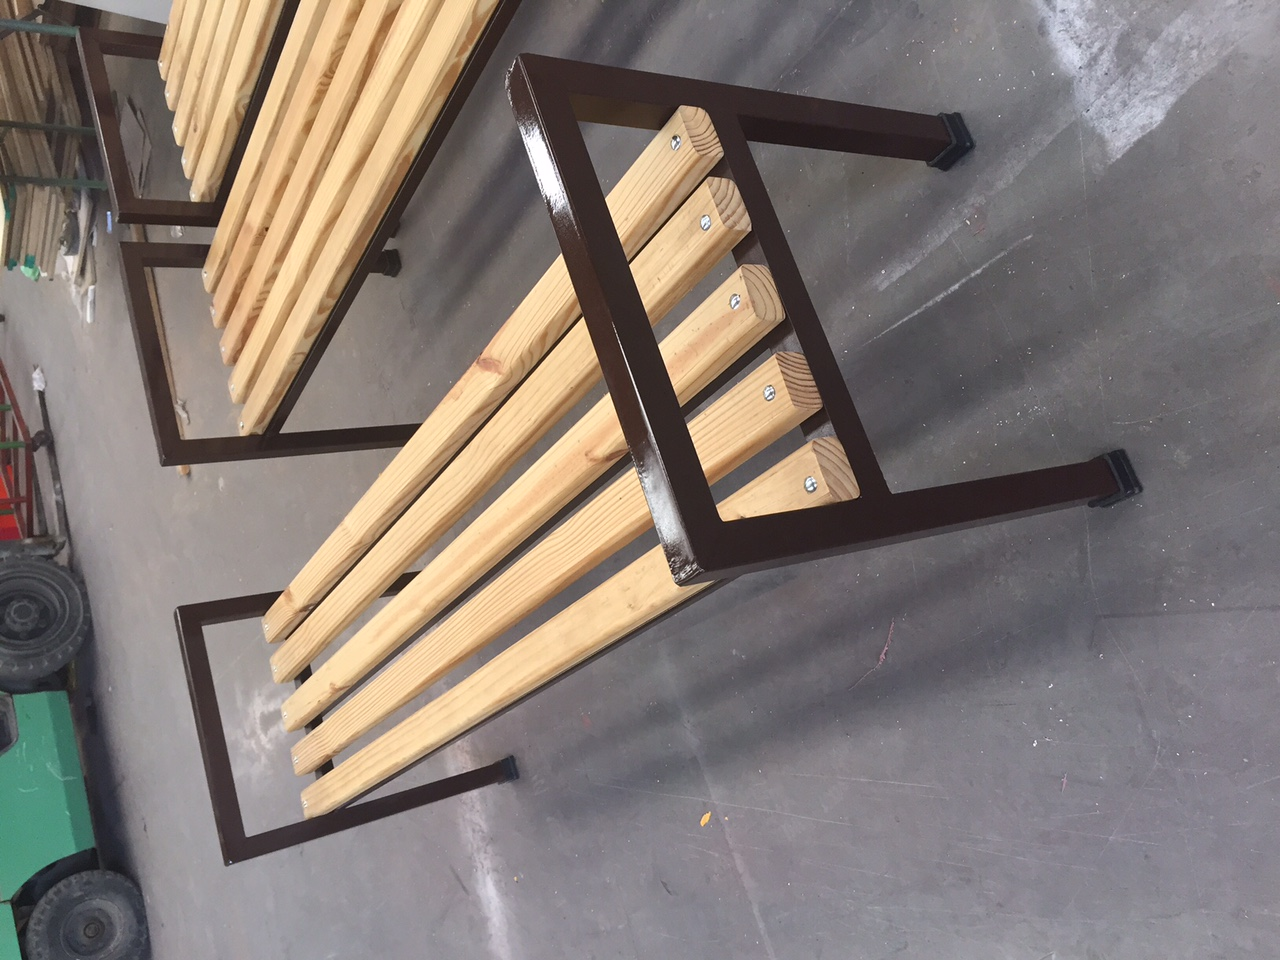 Imagenes de bancos de madera excellent imagenes de bancos - Banco de madera ...